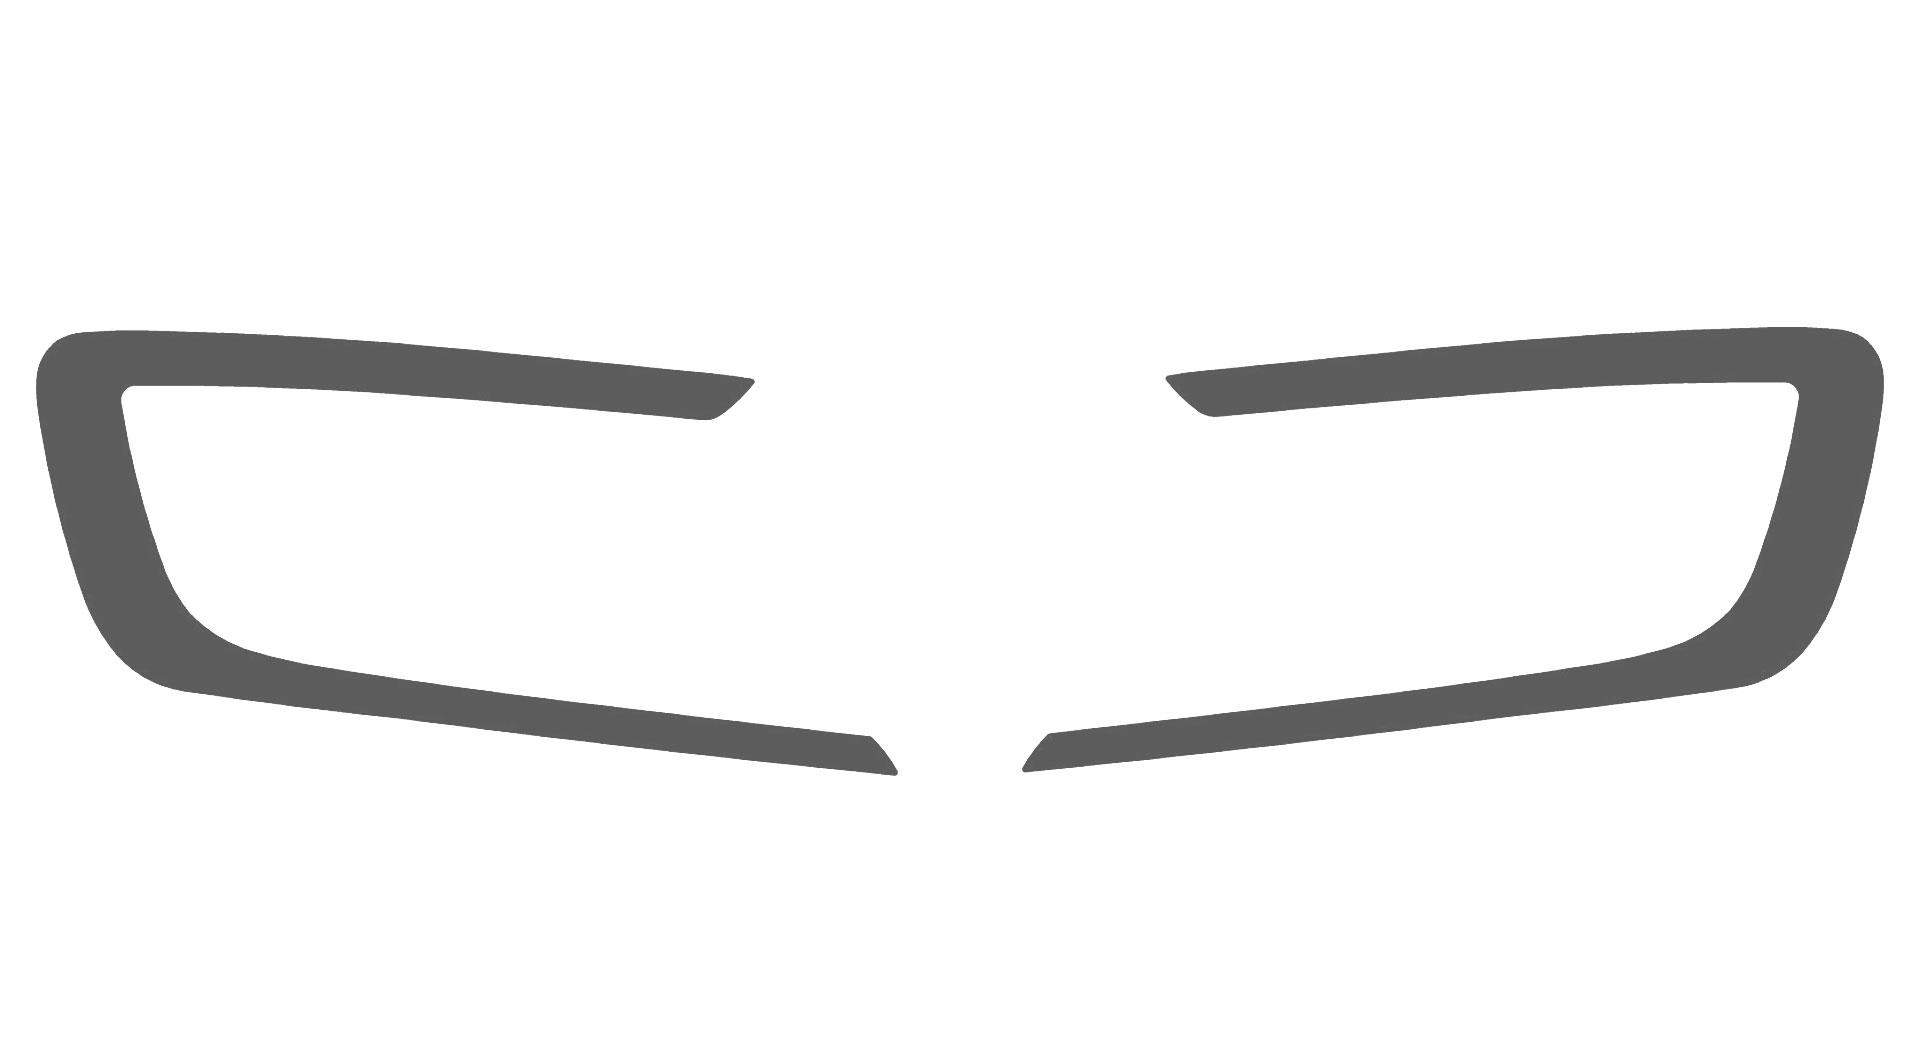 Rshield™ Volkswagen e-Golf 2015-2017 Fog Light Protection Kit on chevy 4x4 actuator diagram, chevy hhr diagram, fuse box diagram, ford expedition diagram, f150 trailer plug diagram, egr valve diagram, magneto ignition system diagram, power steering pump diagram, telephone network diagram, solex carburetor diagram, fog machine, mazda 3 parts diagram, a/c compressor diagram, headlight adjustment diagram, spark plugs diagram, 2006 hhr parts diagram, cigarette lighter diagram, steering box diagram, switch diagram, 2002 ford f350 fuse panel diagram,